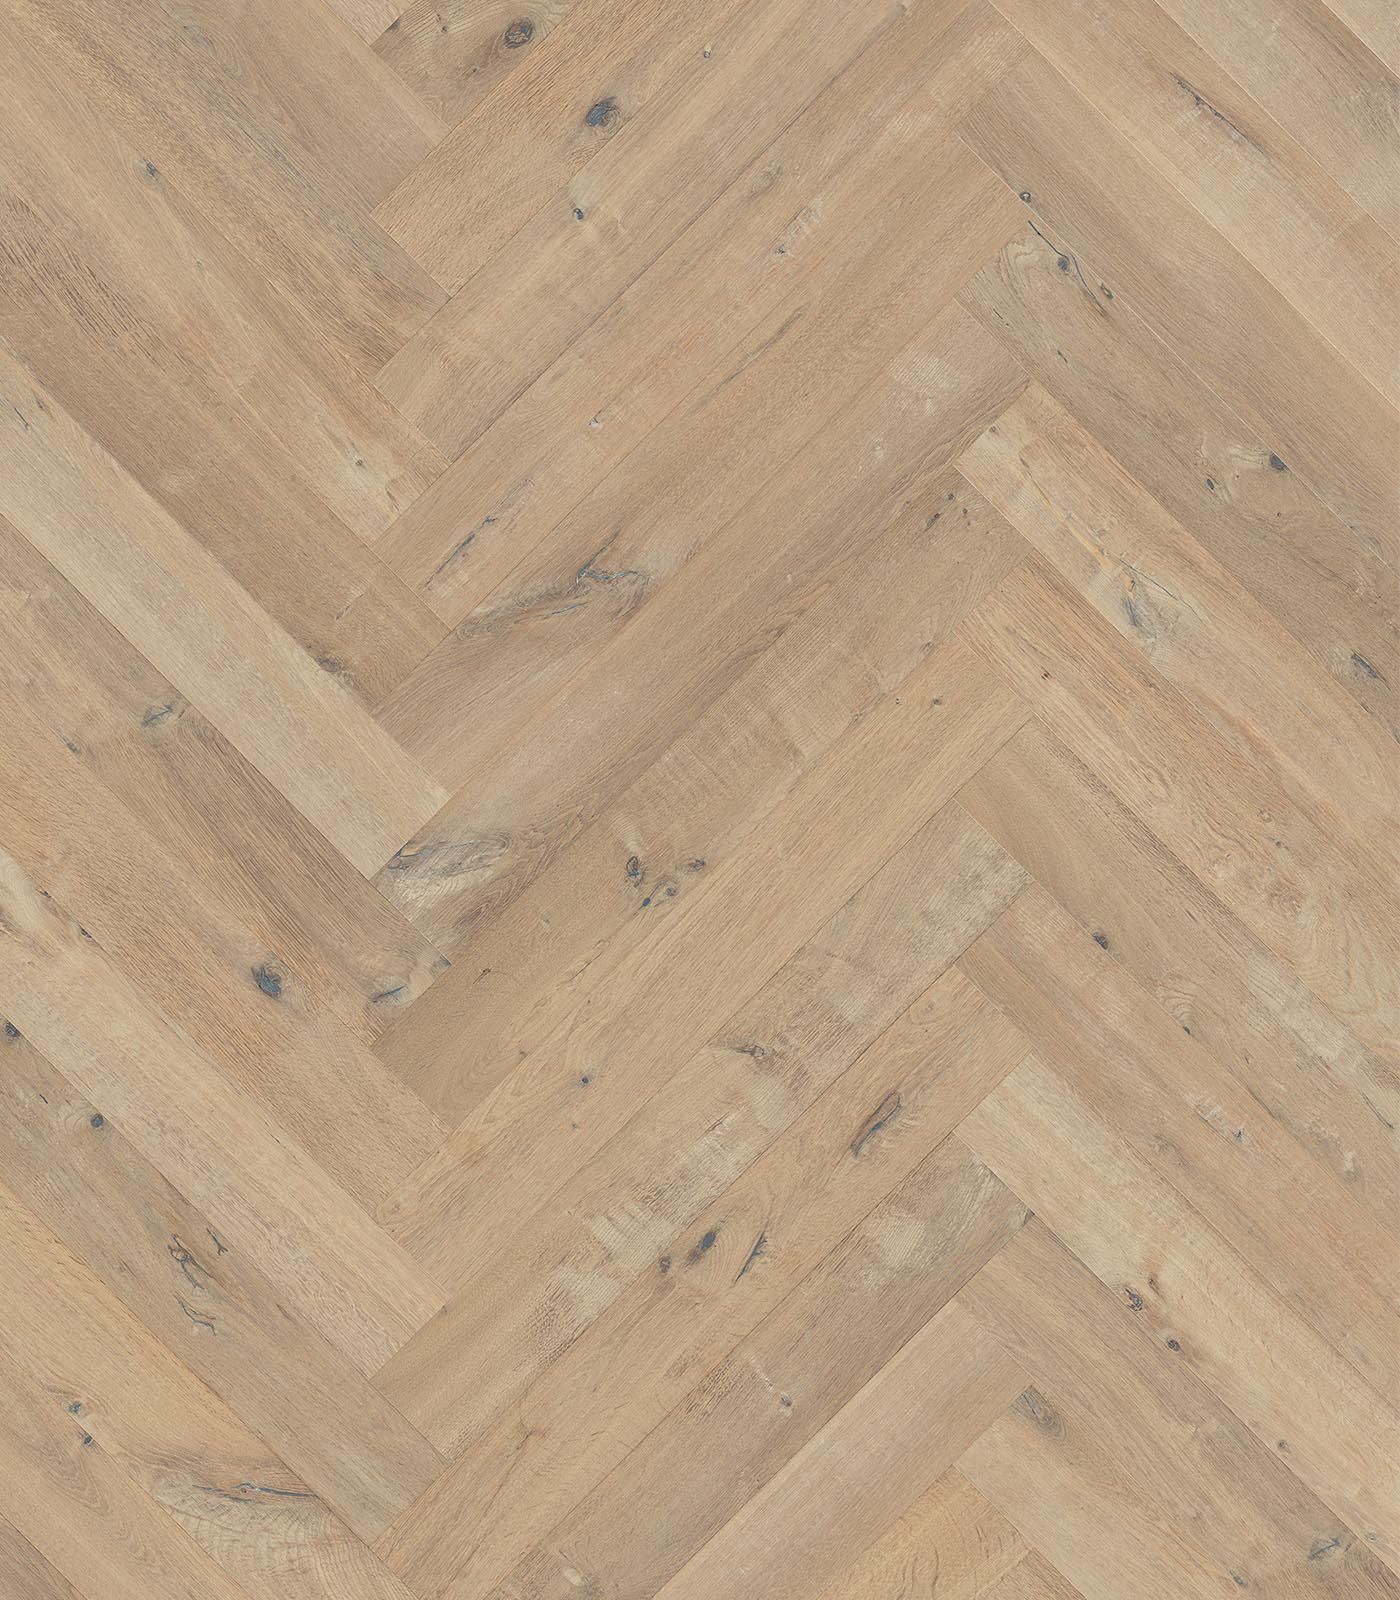 Herringbone-Fashion collection-Mauritius-Western European oak flooring-flat